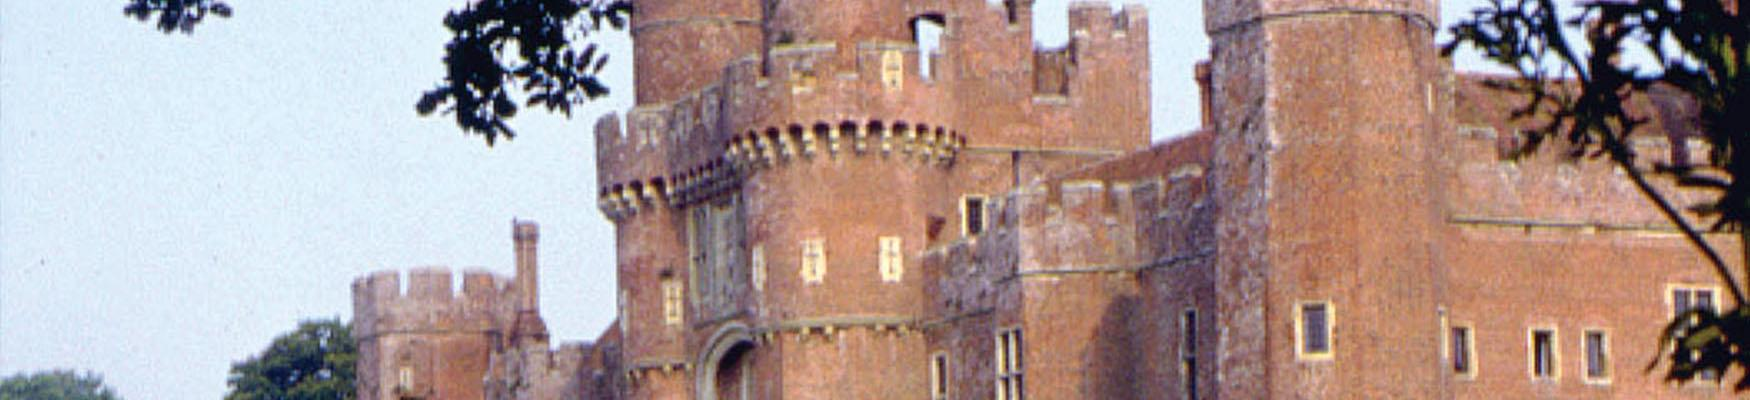 Close up of Herstmonceux castle turrets